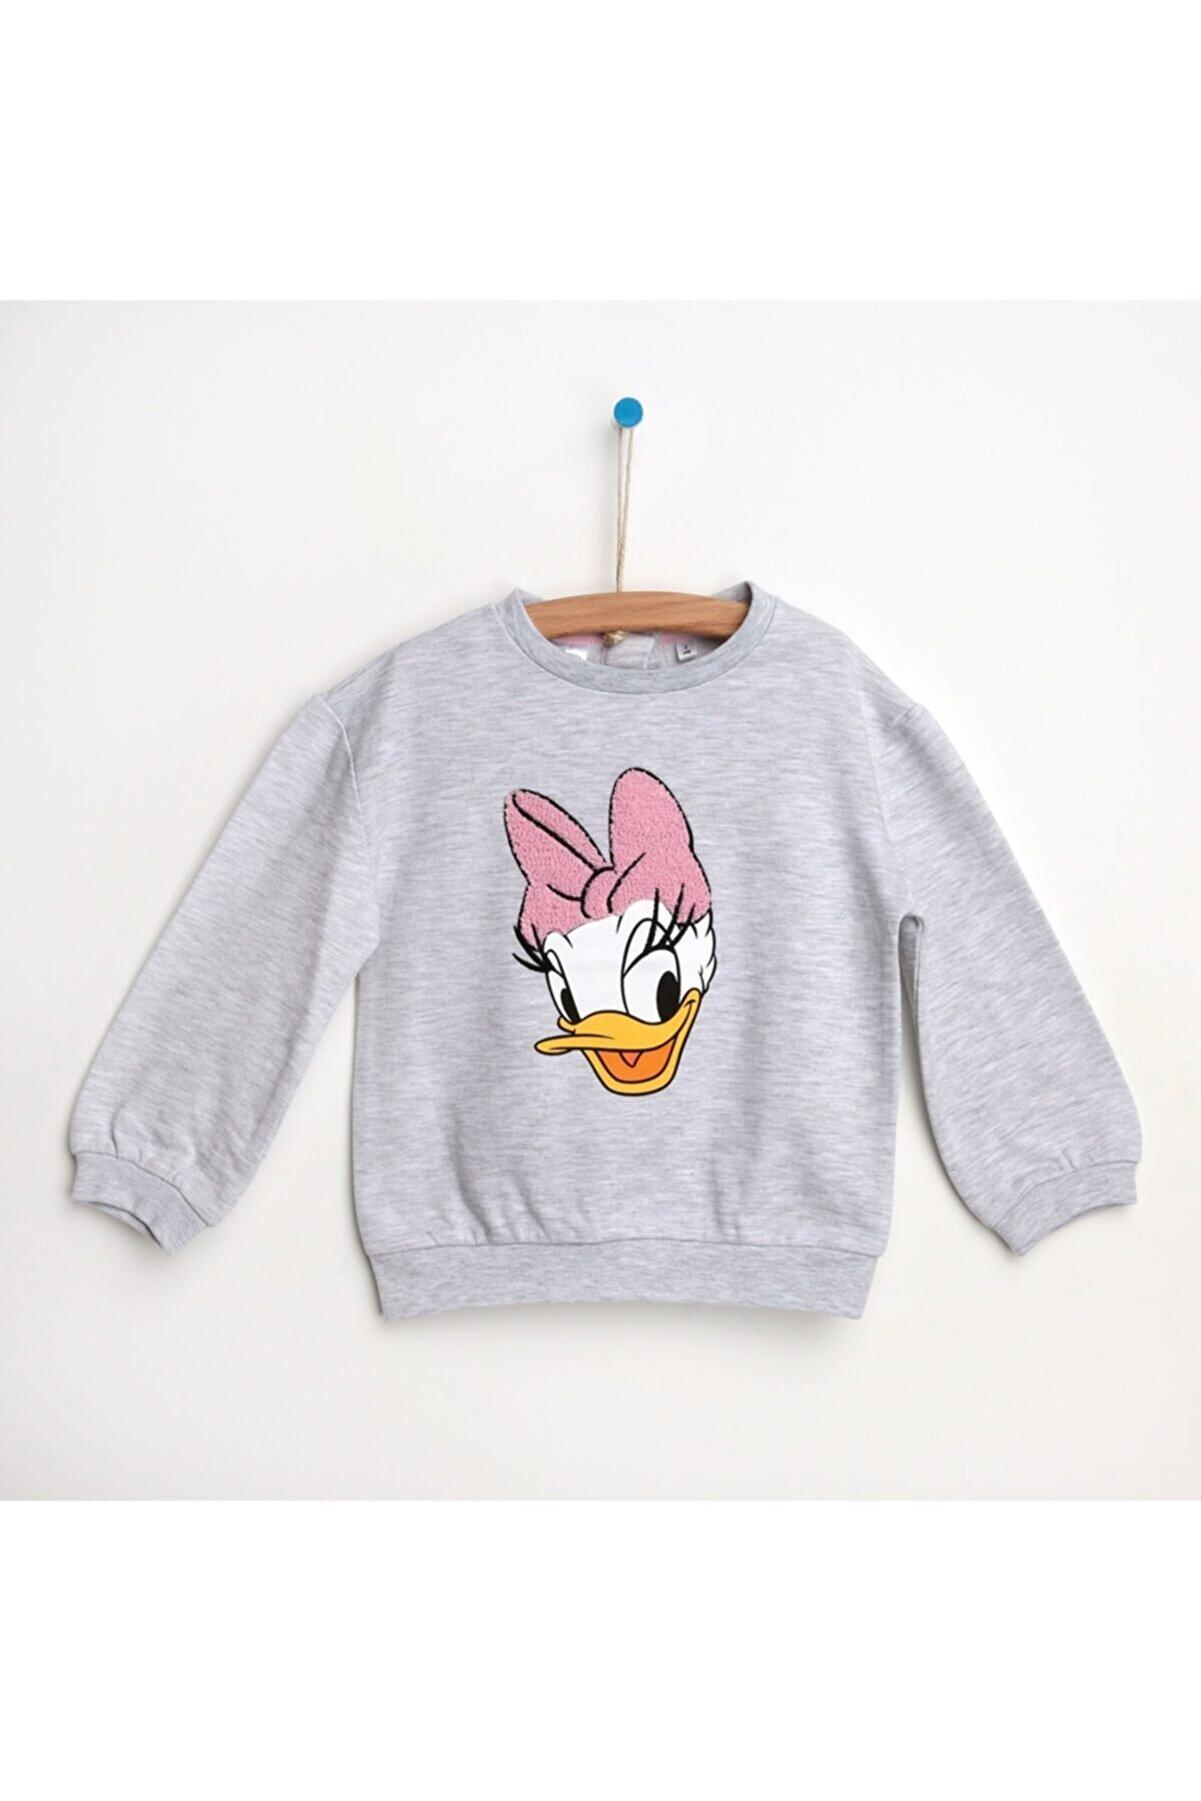 DİSNEY Unisex Bebek Daisy Duck Sweatshirt